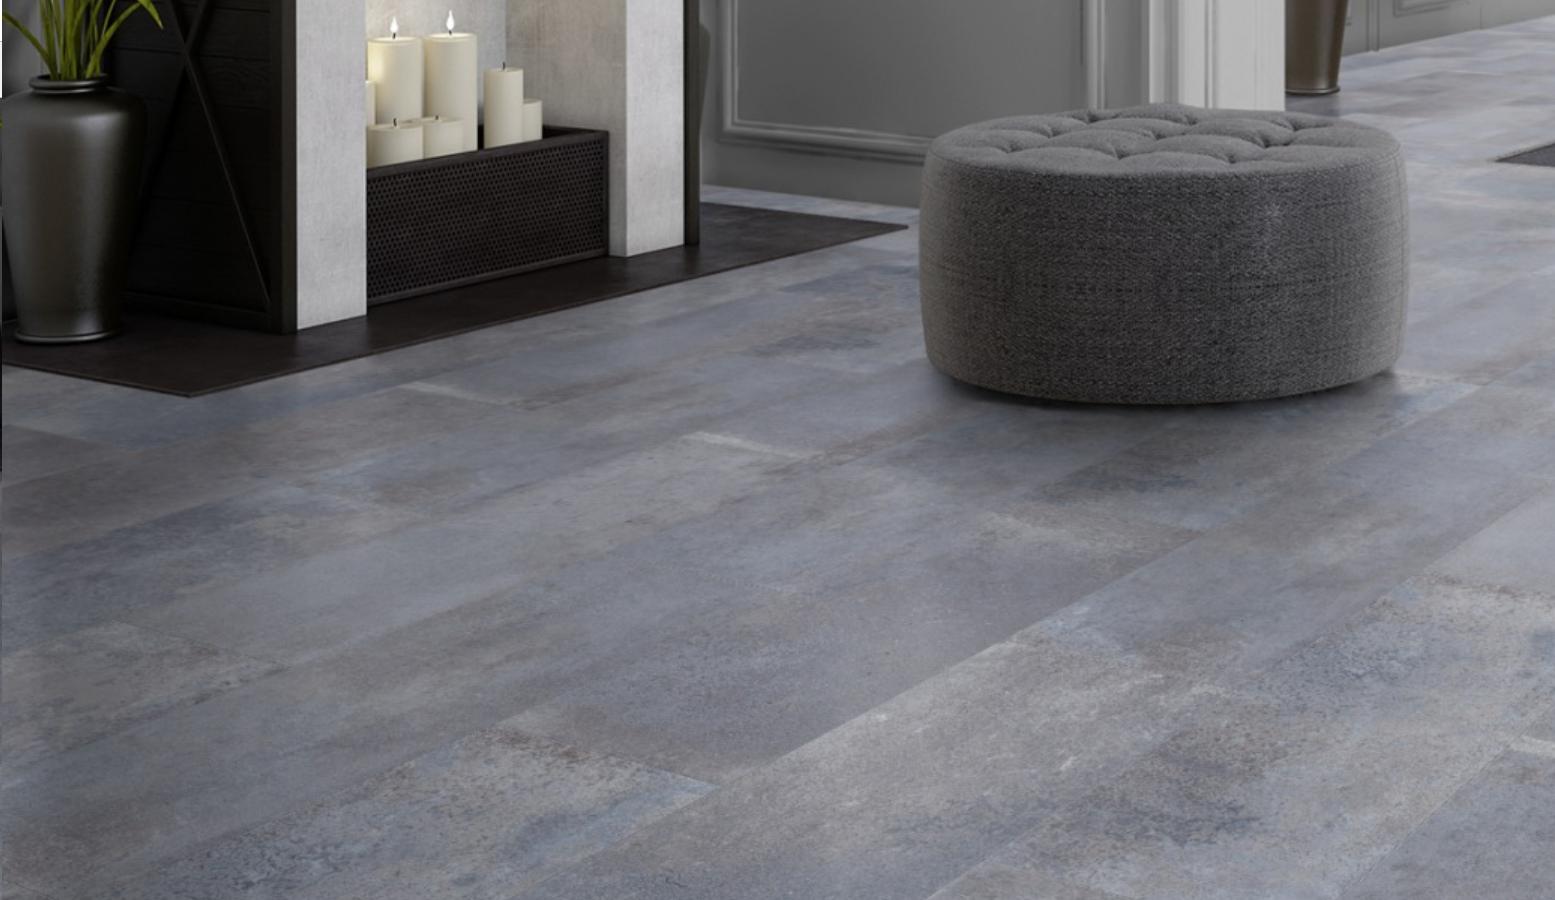 Tegel Laminaat Concrete betongrijs 44407 Visio Grande